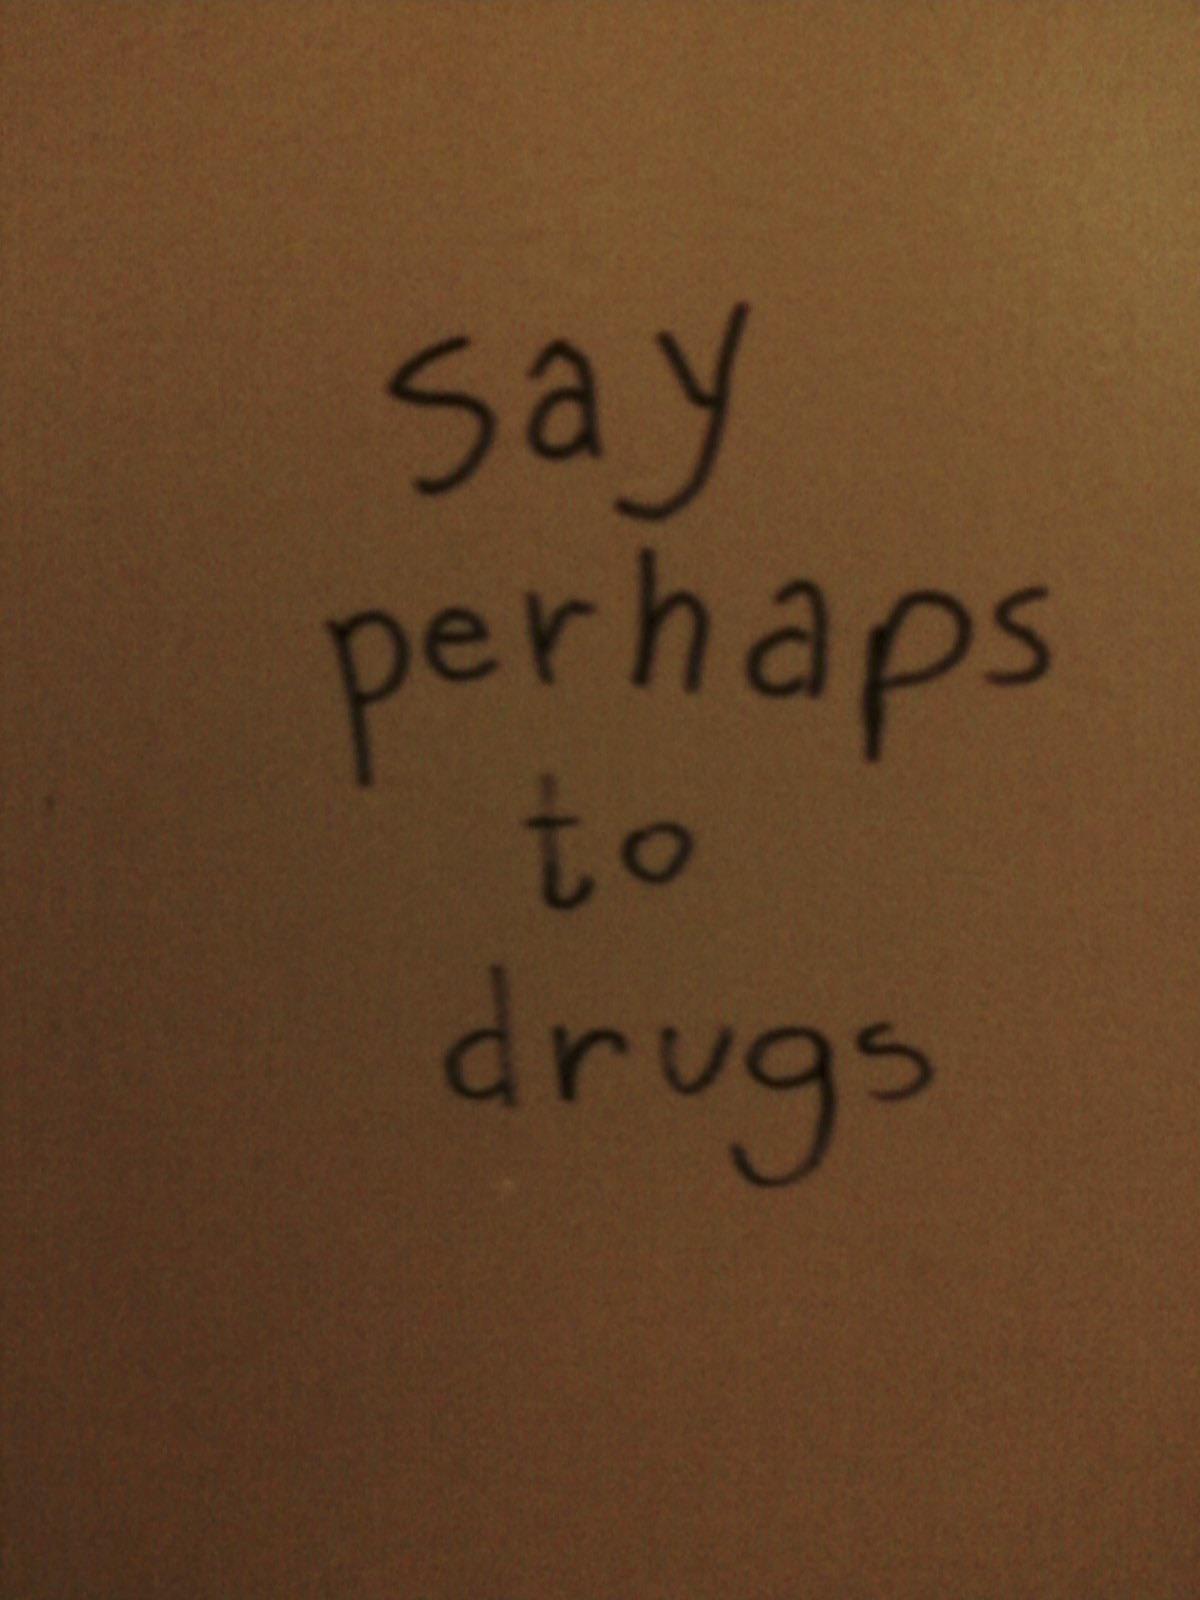 This graffiti in the girls bathroom